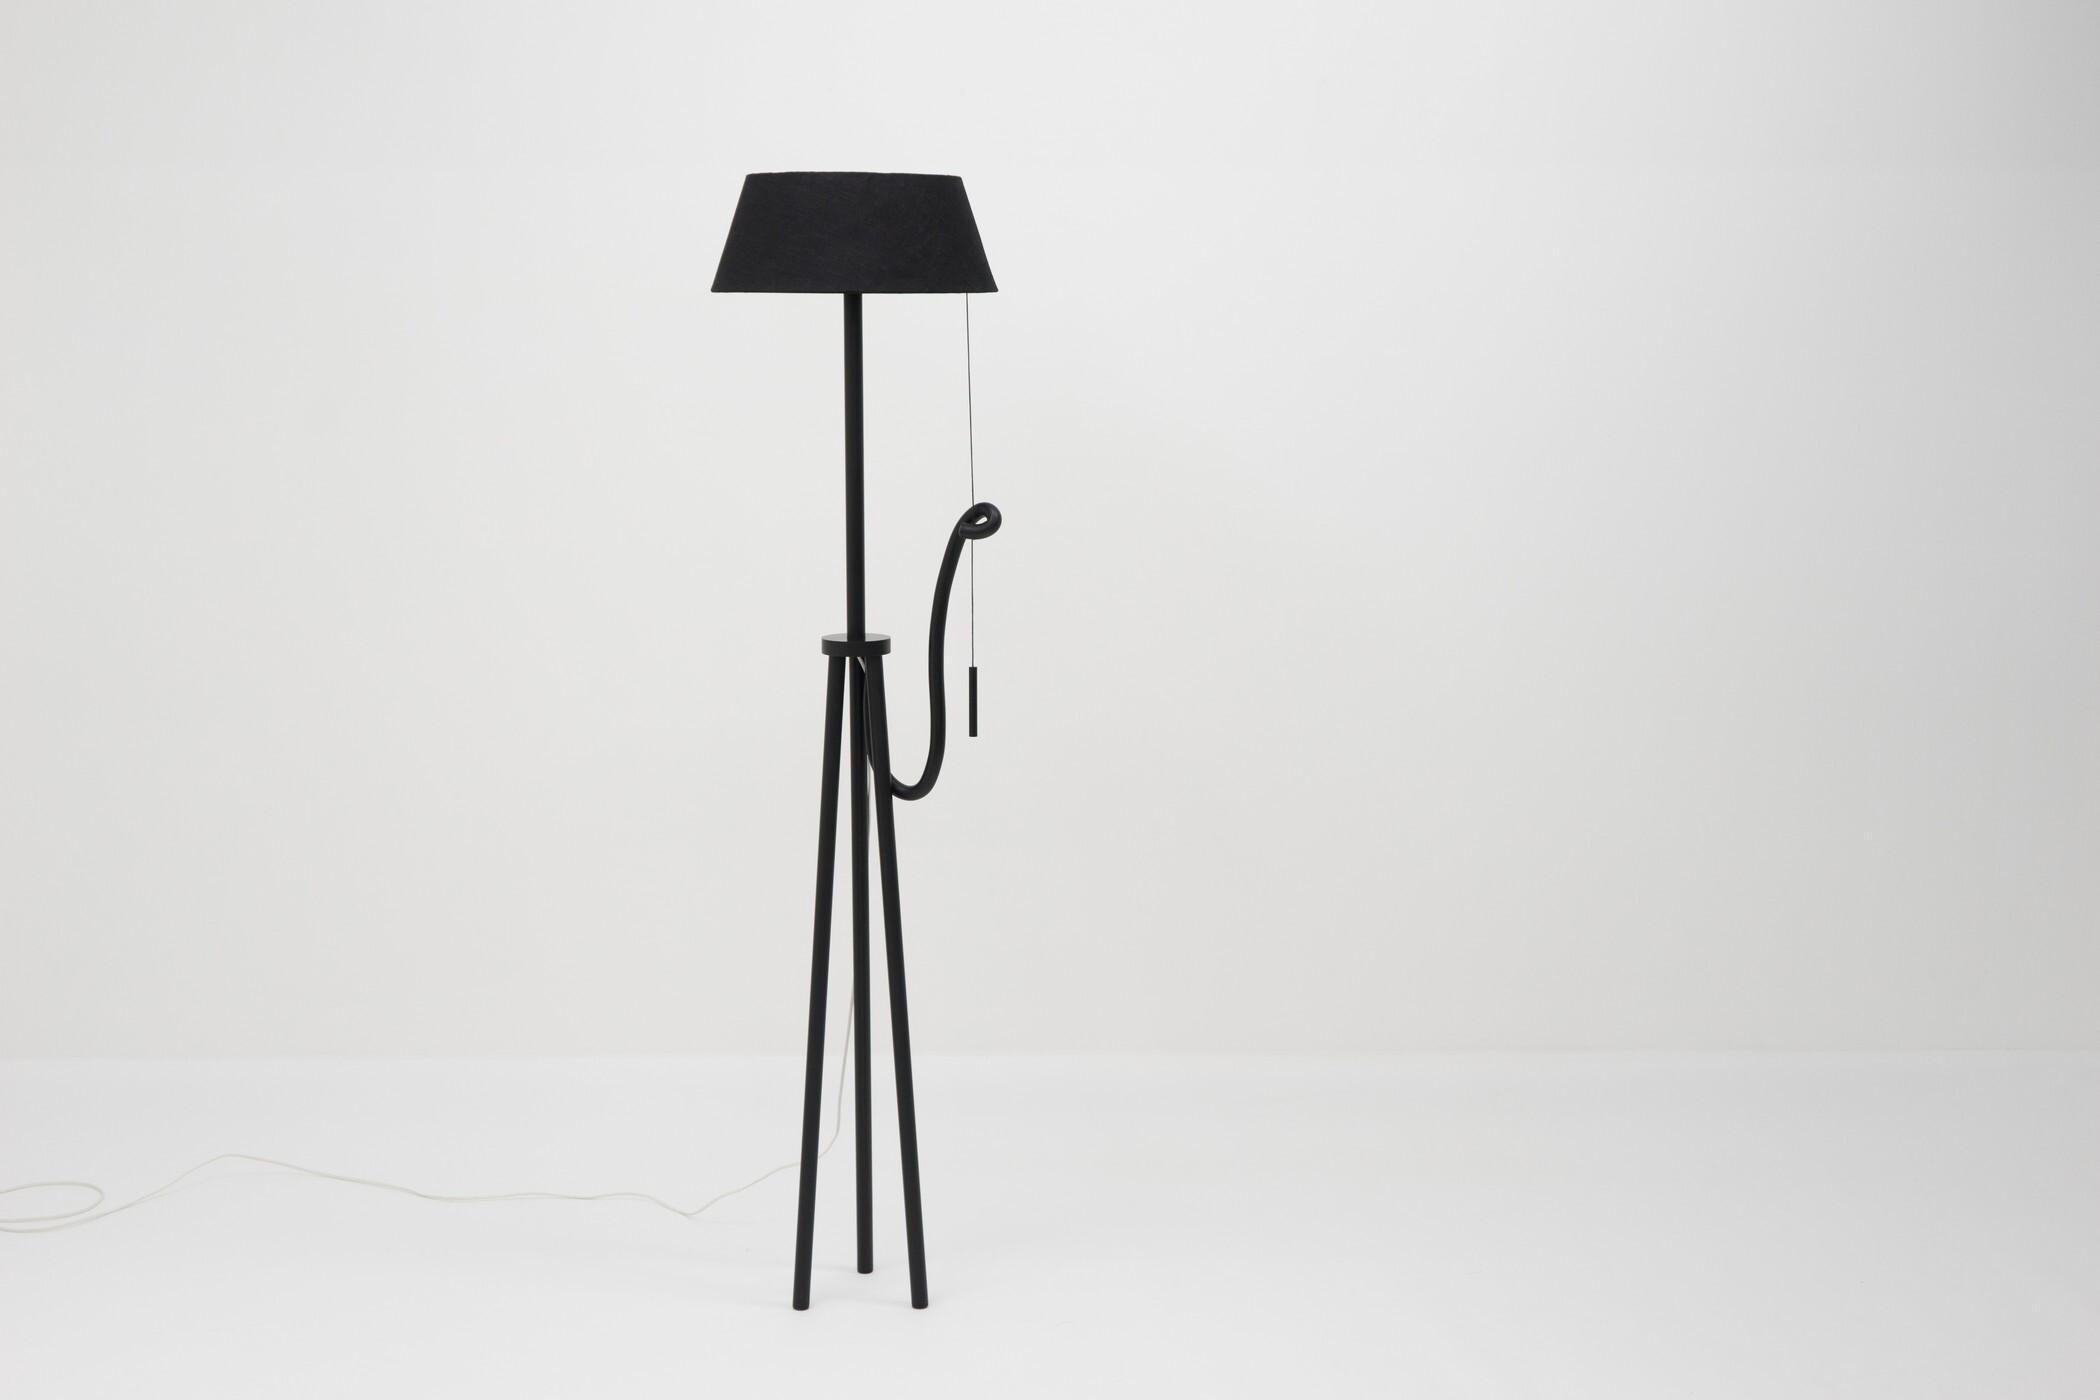 Angry Lamp